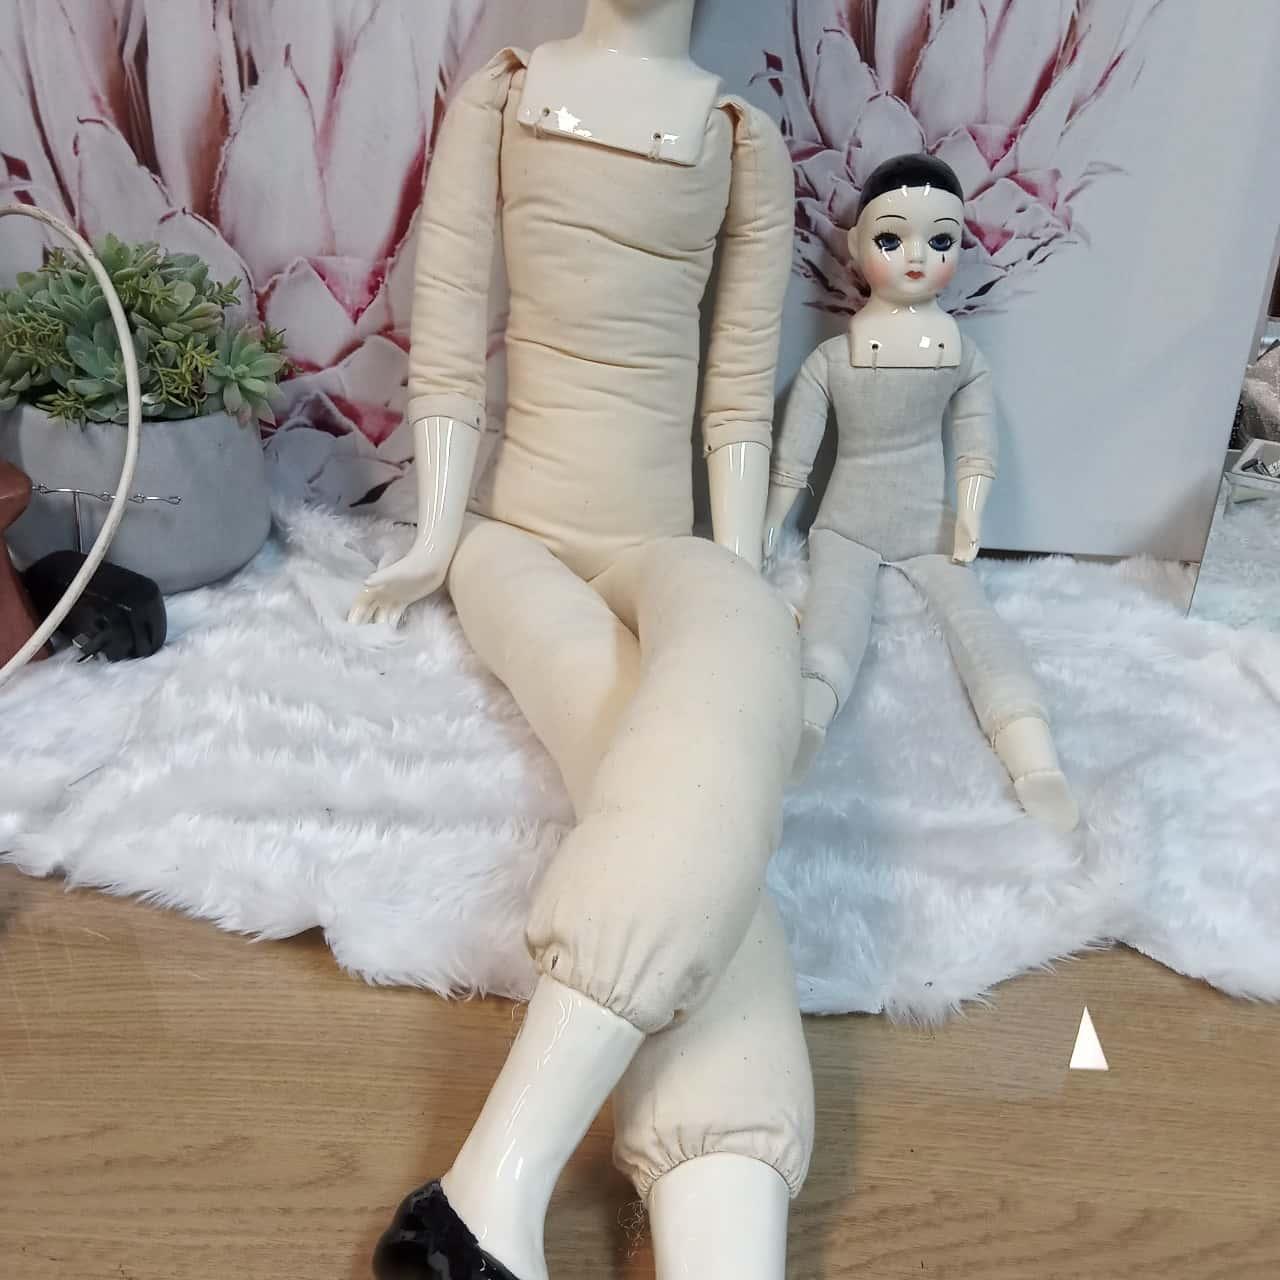 Porcelain and Rag Clown Dolls